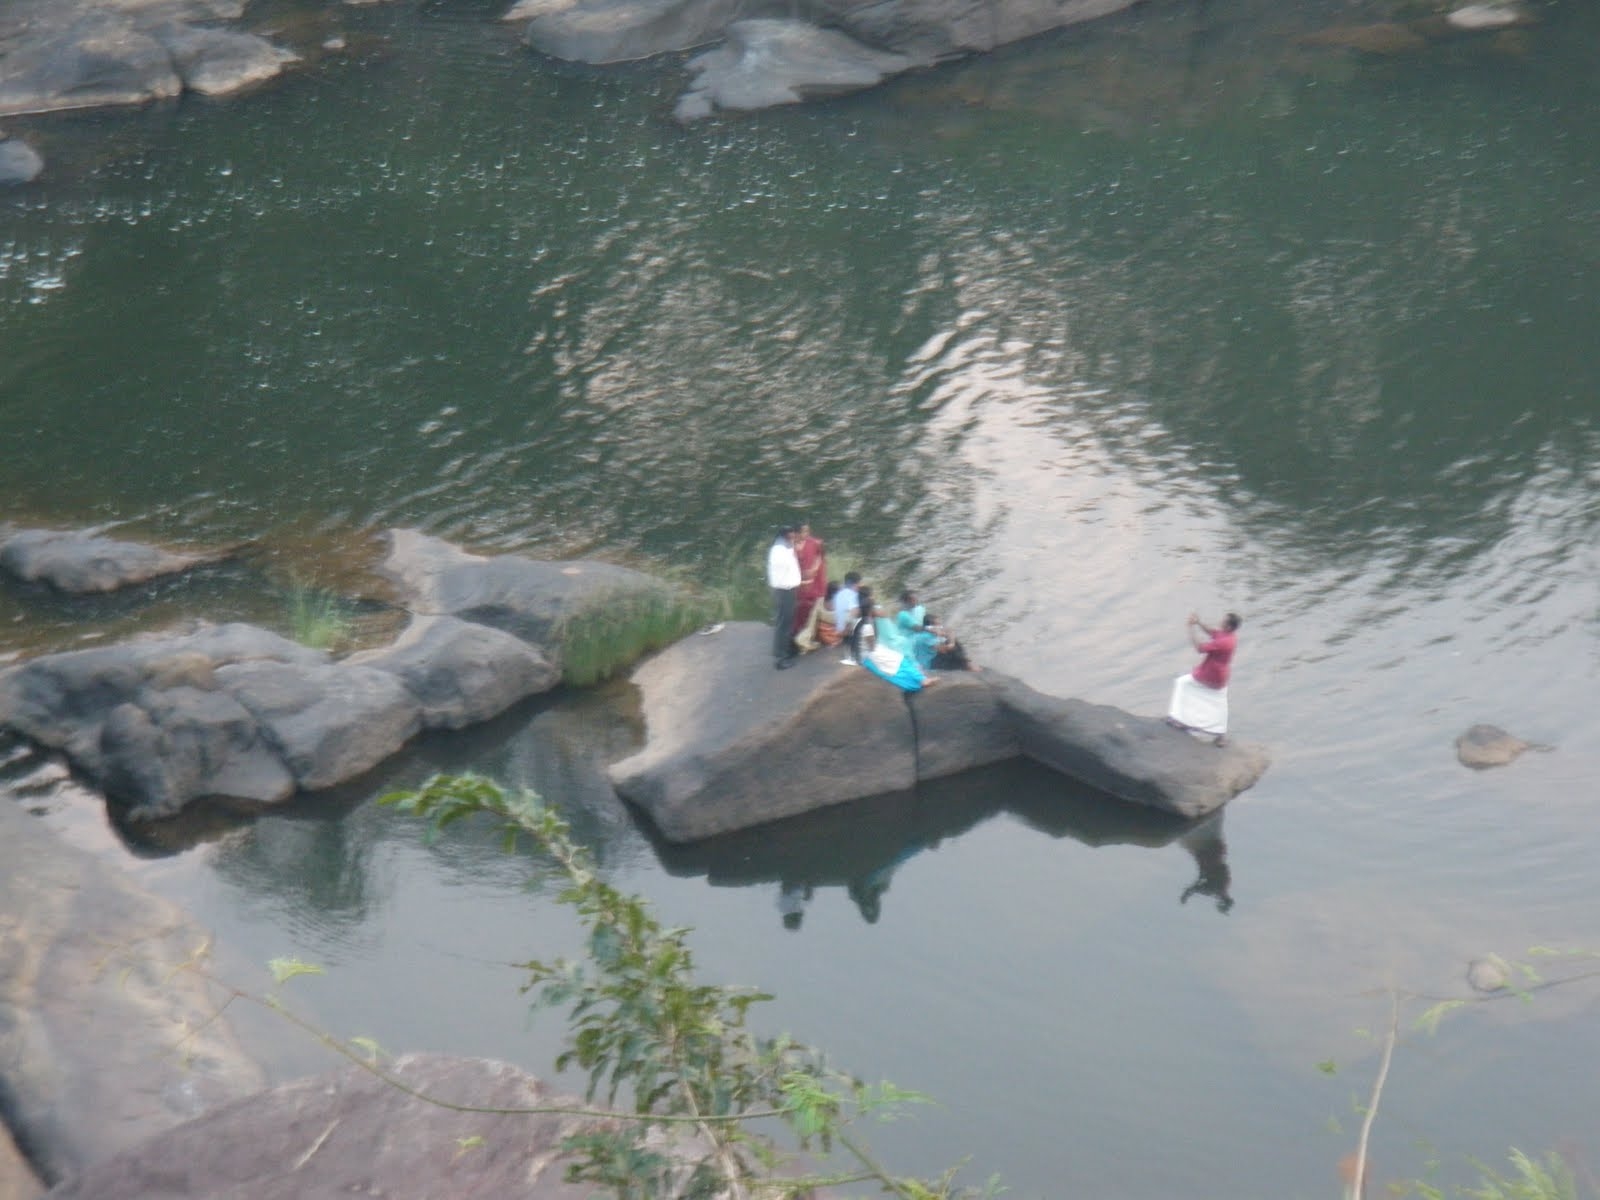 Perumthenauruvi Waterfalls